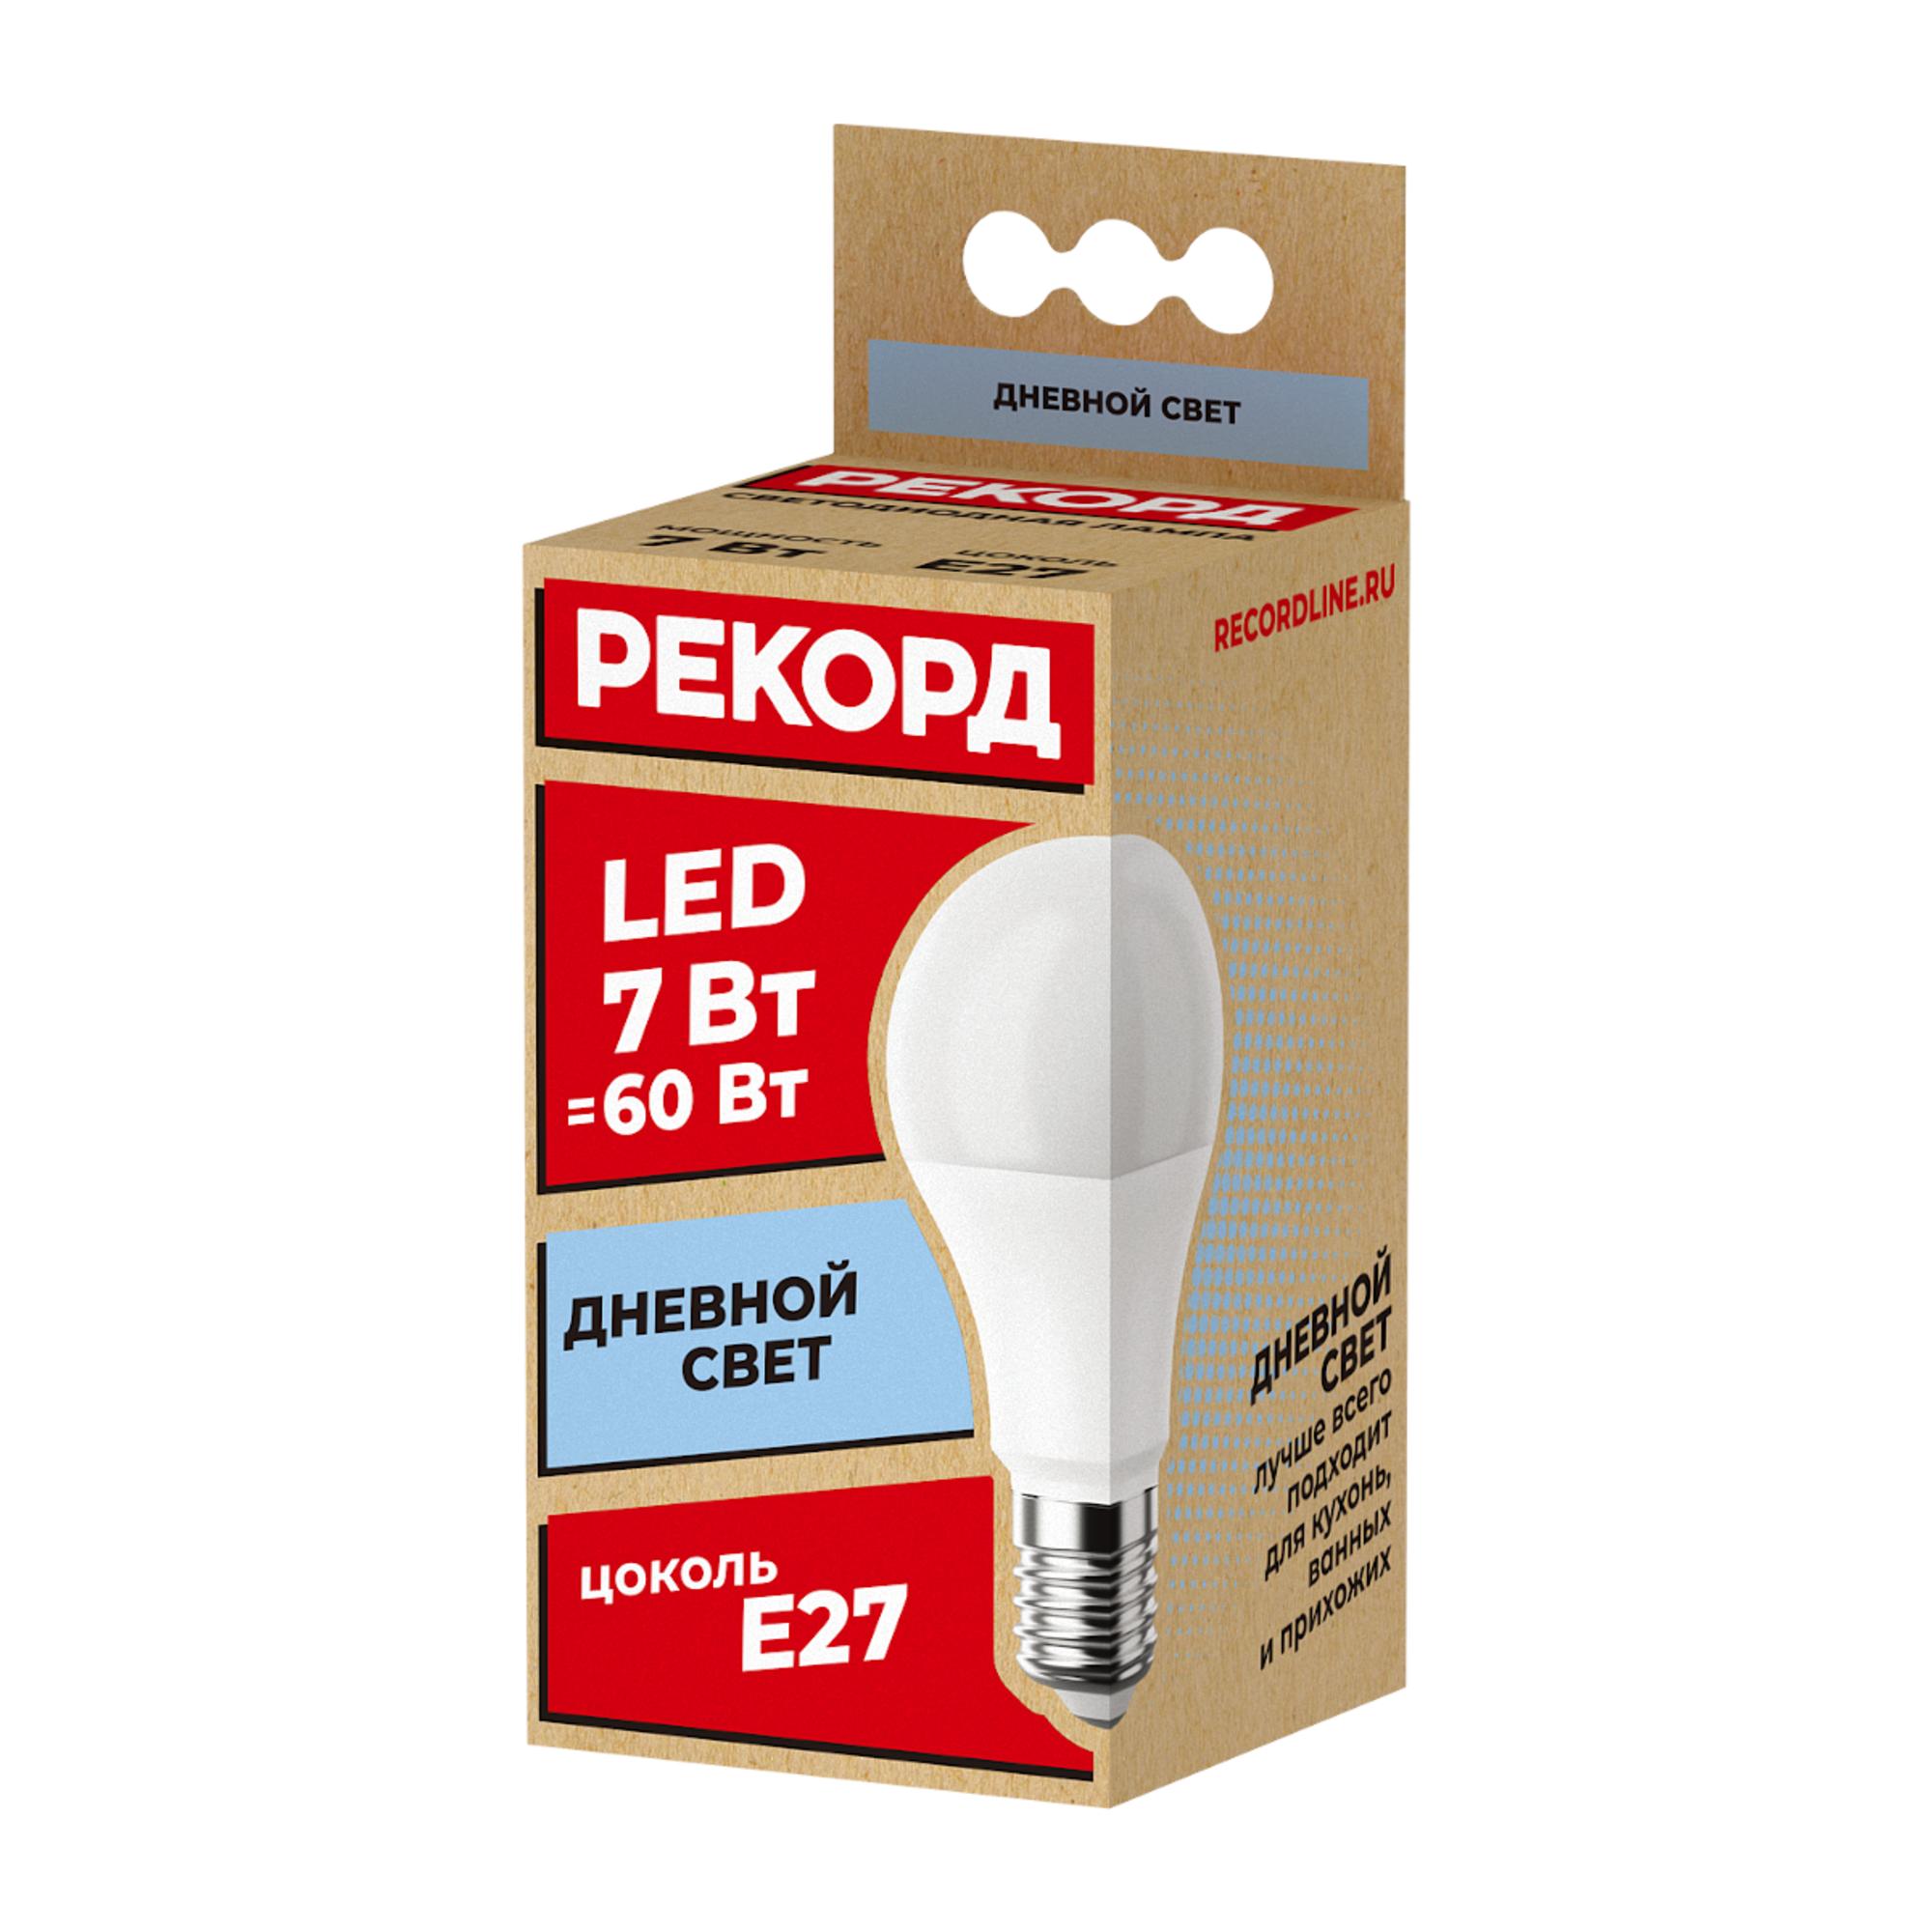 Светодиодная лампочка Рекорд 23874 E27 70 Лм 7 Вт